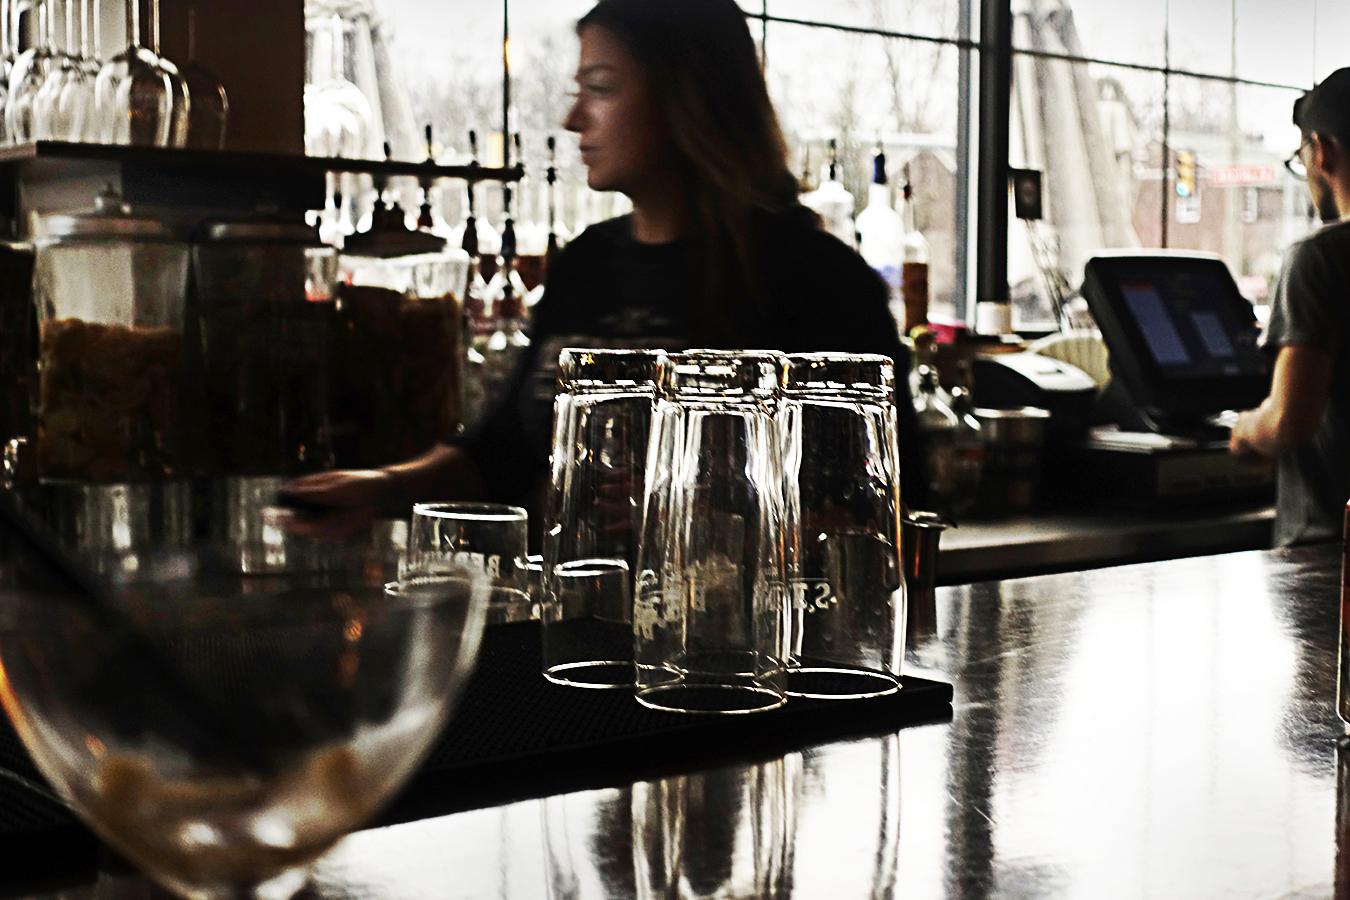 Happy Hour. Bernie's Bar & Restaurant. Photo: Tony Ward, Copyright 2018